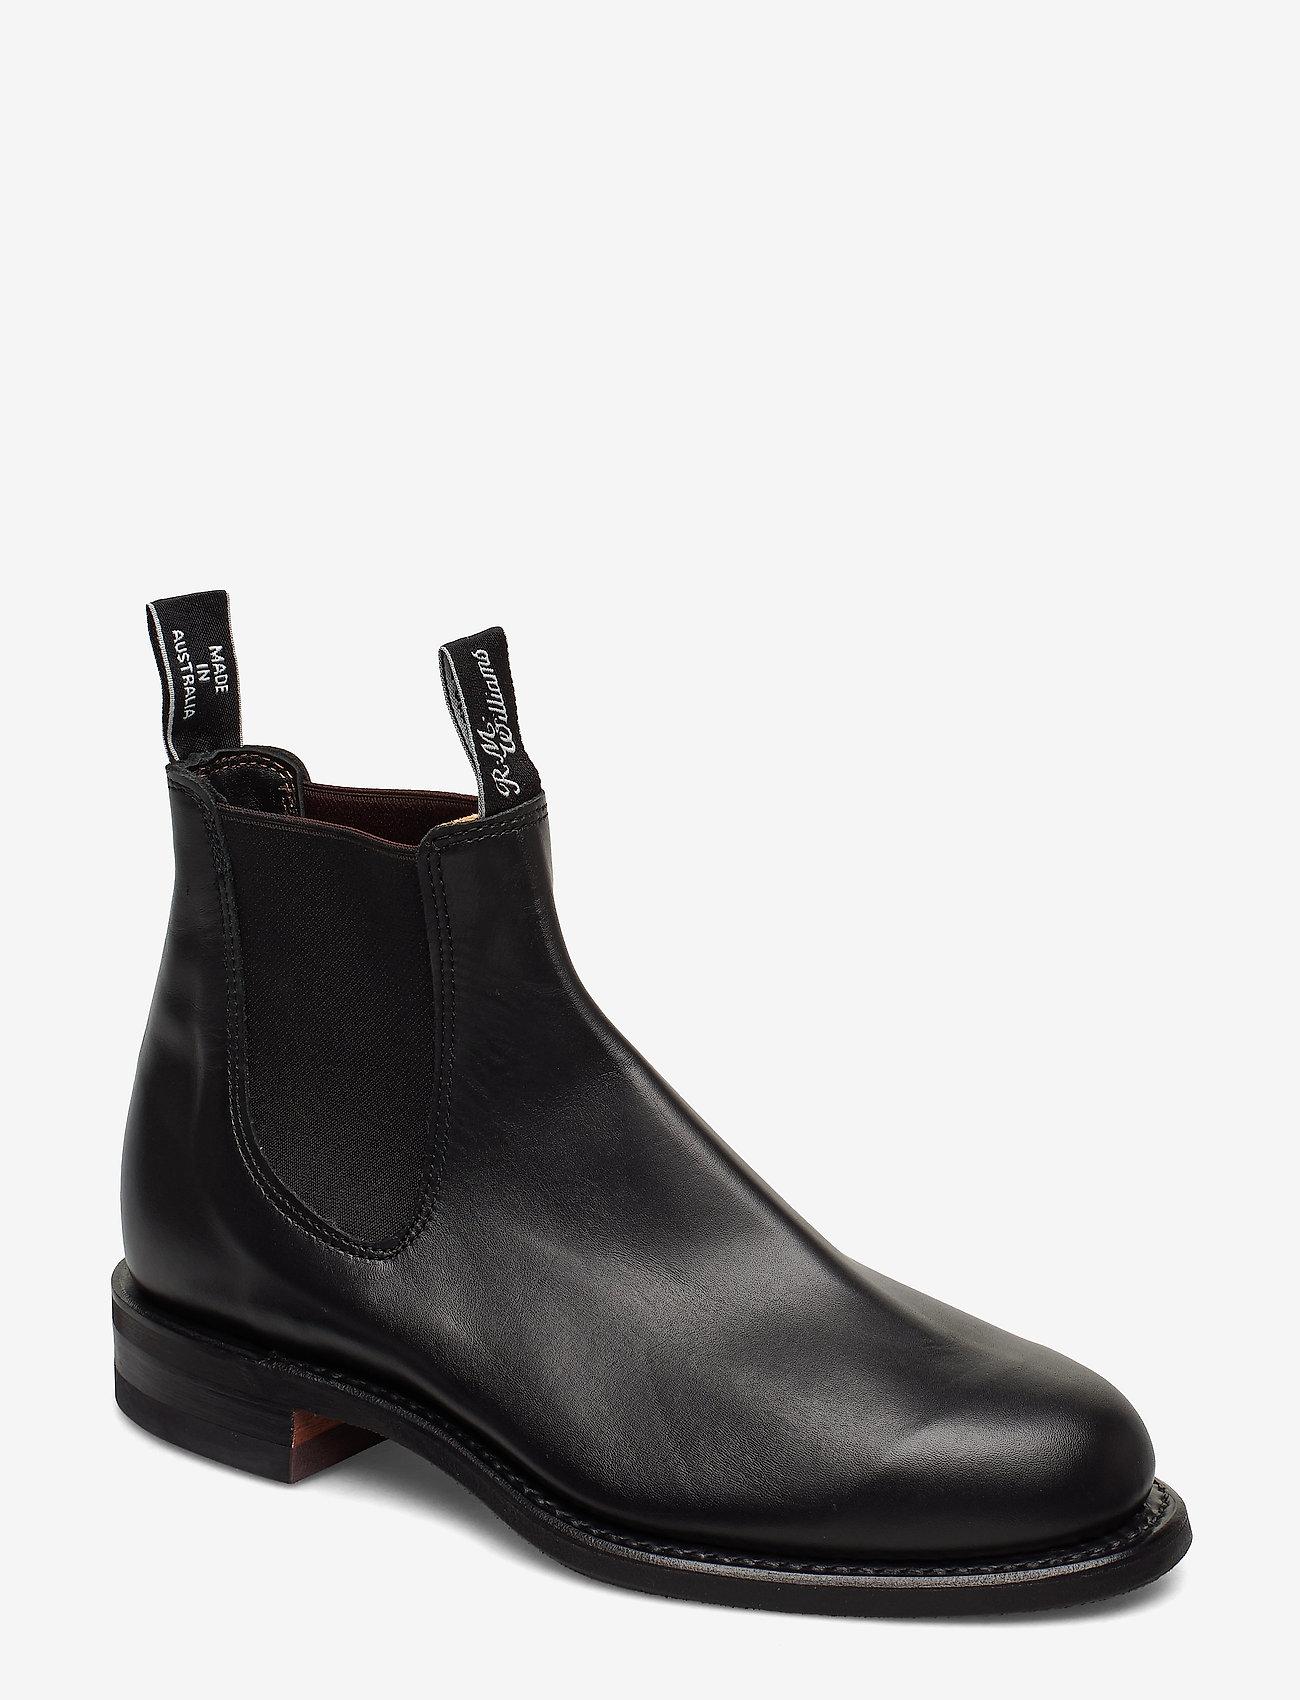 R.M. Williams - Wentworth G-last Yearling Black - støvler - black - 1